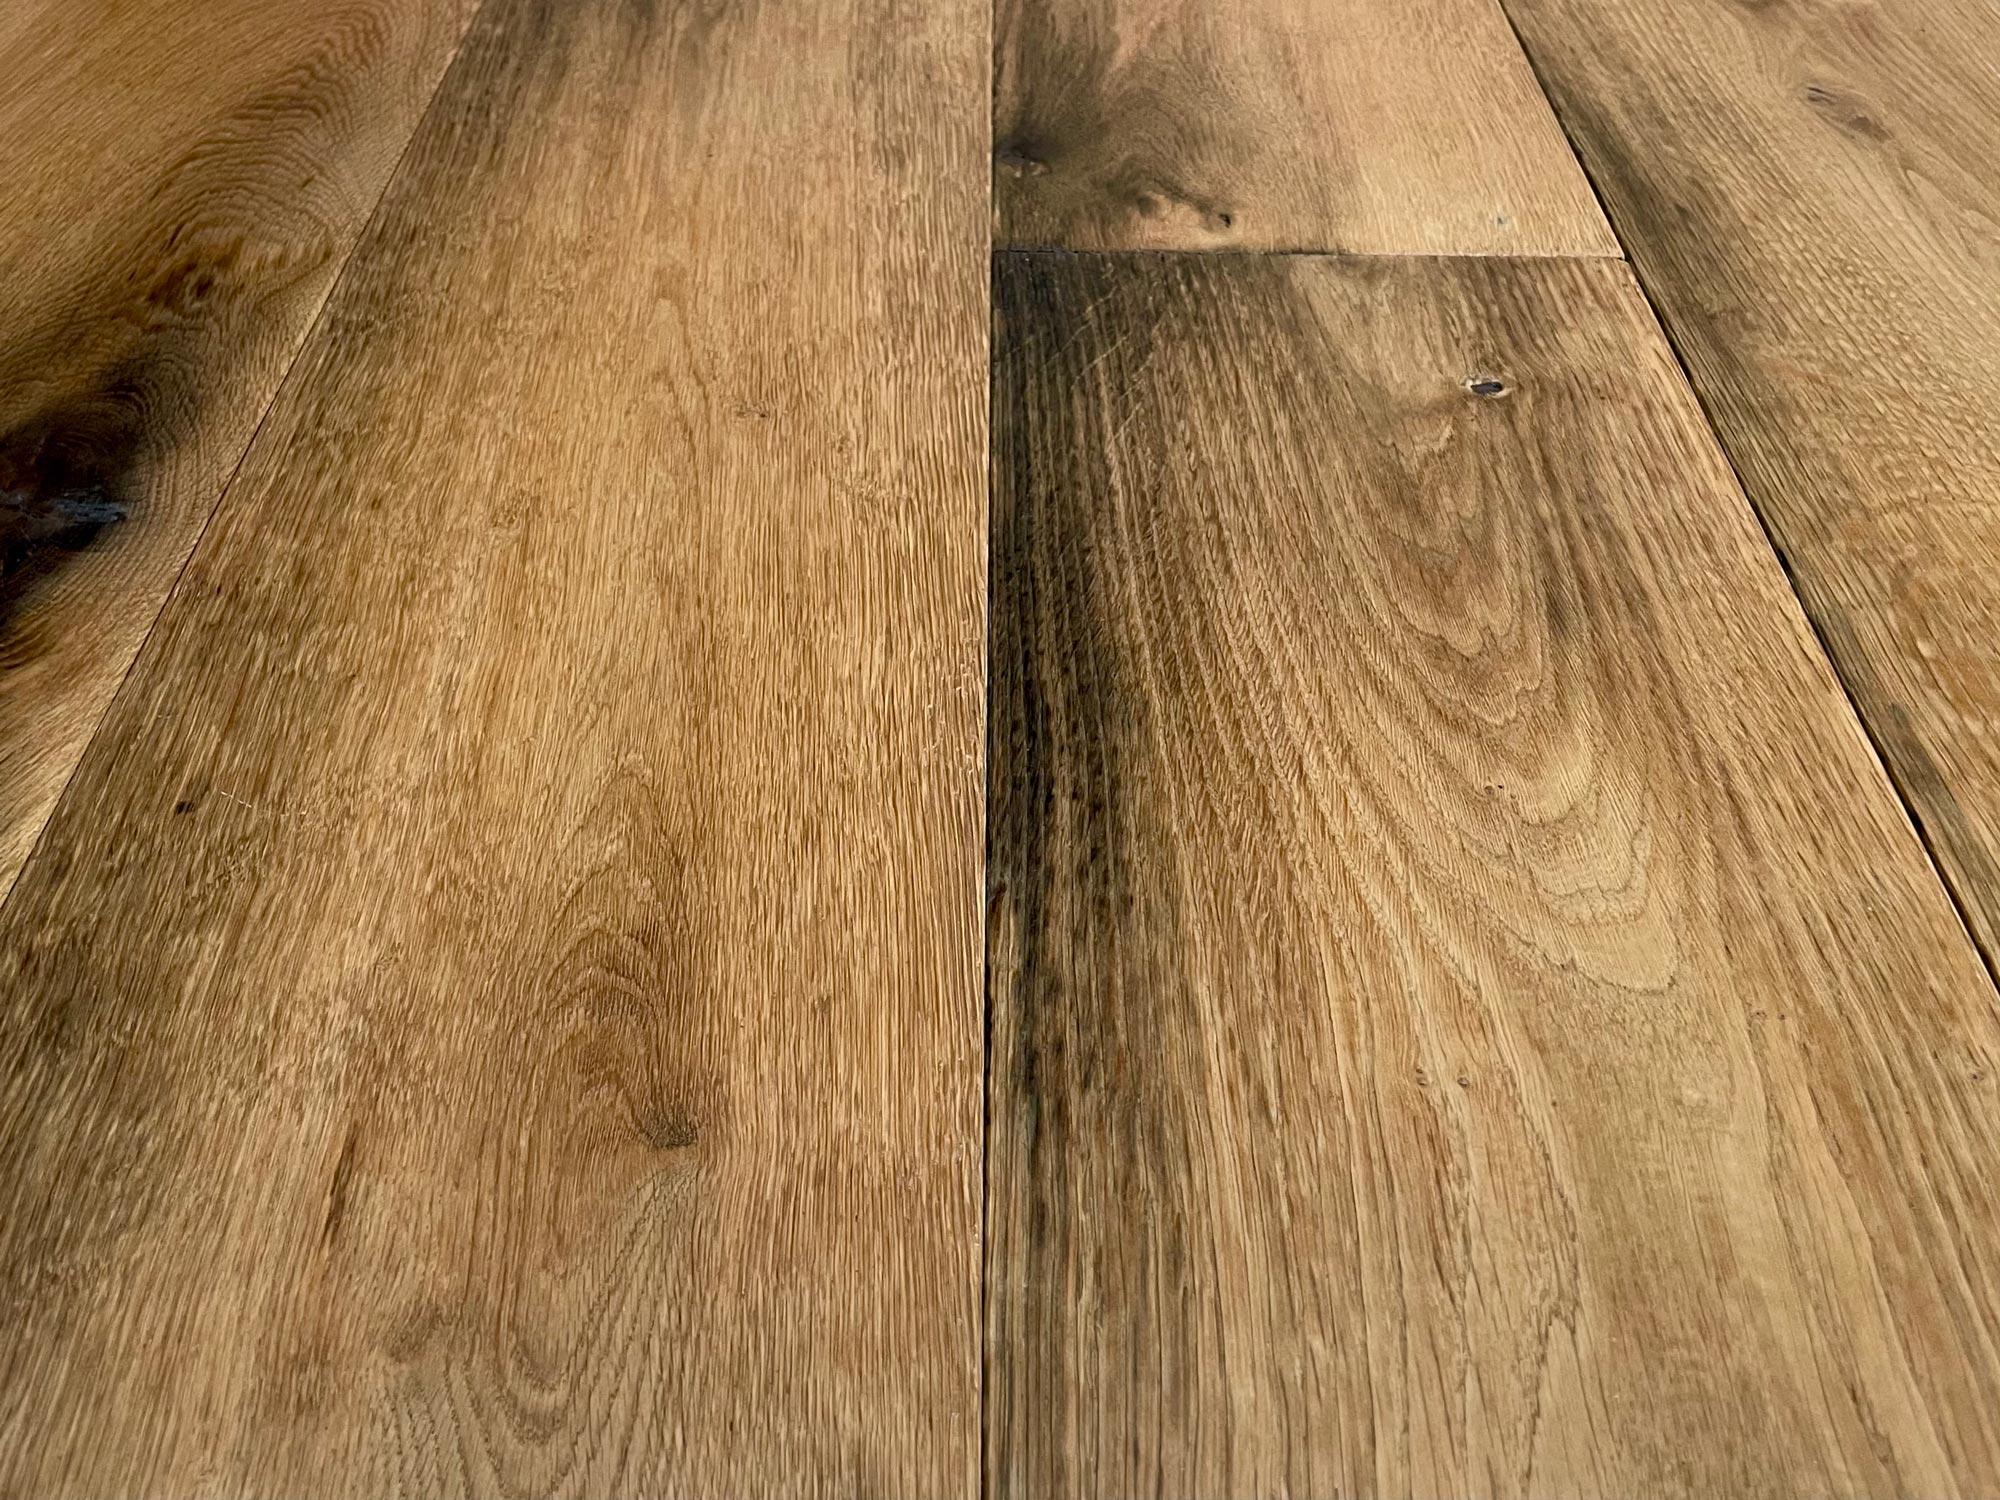 Old foundry oak flooring